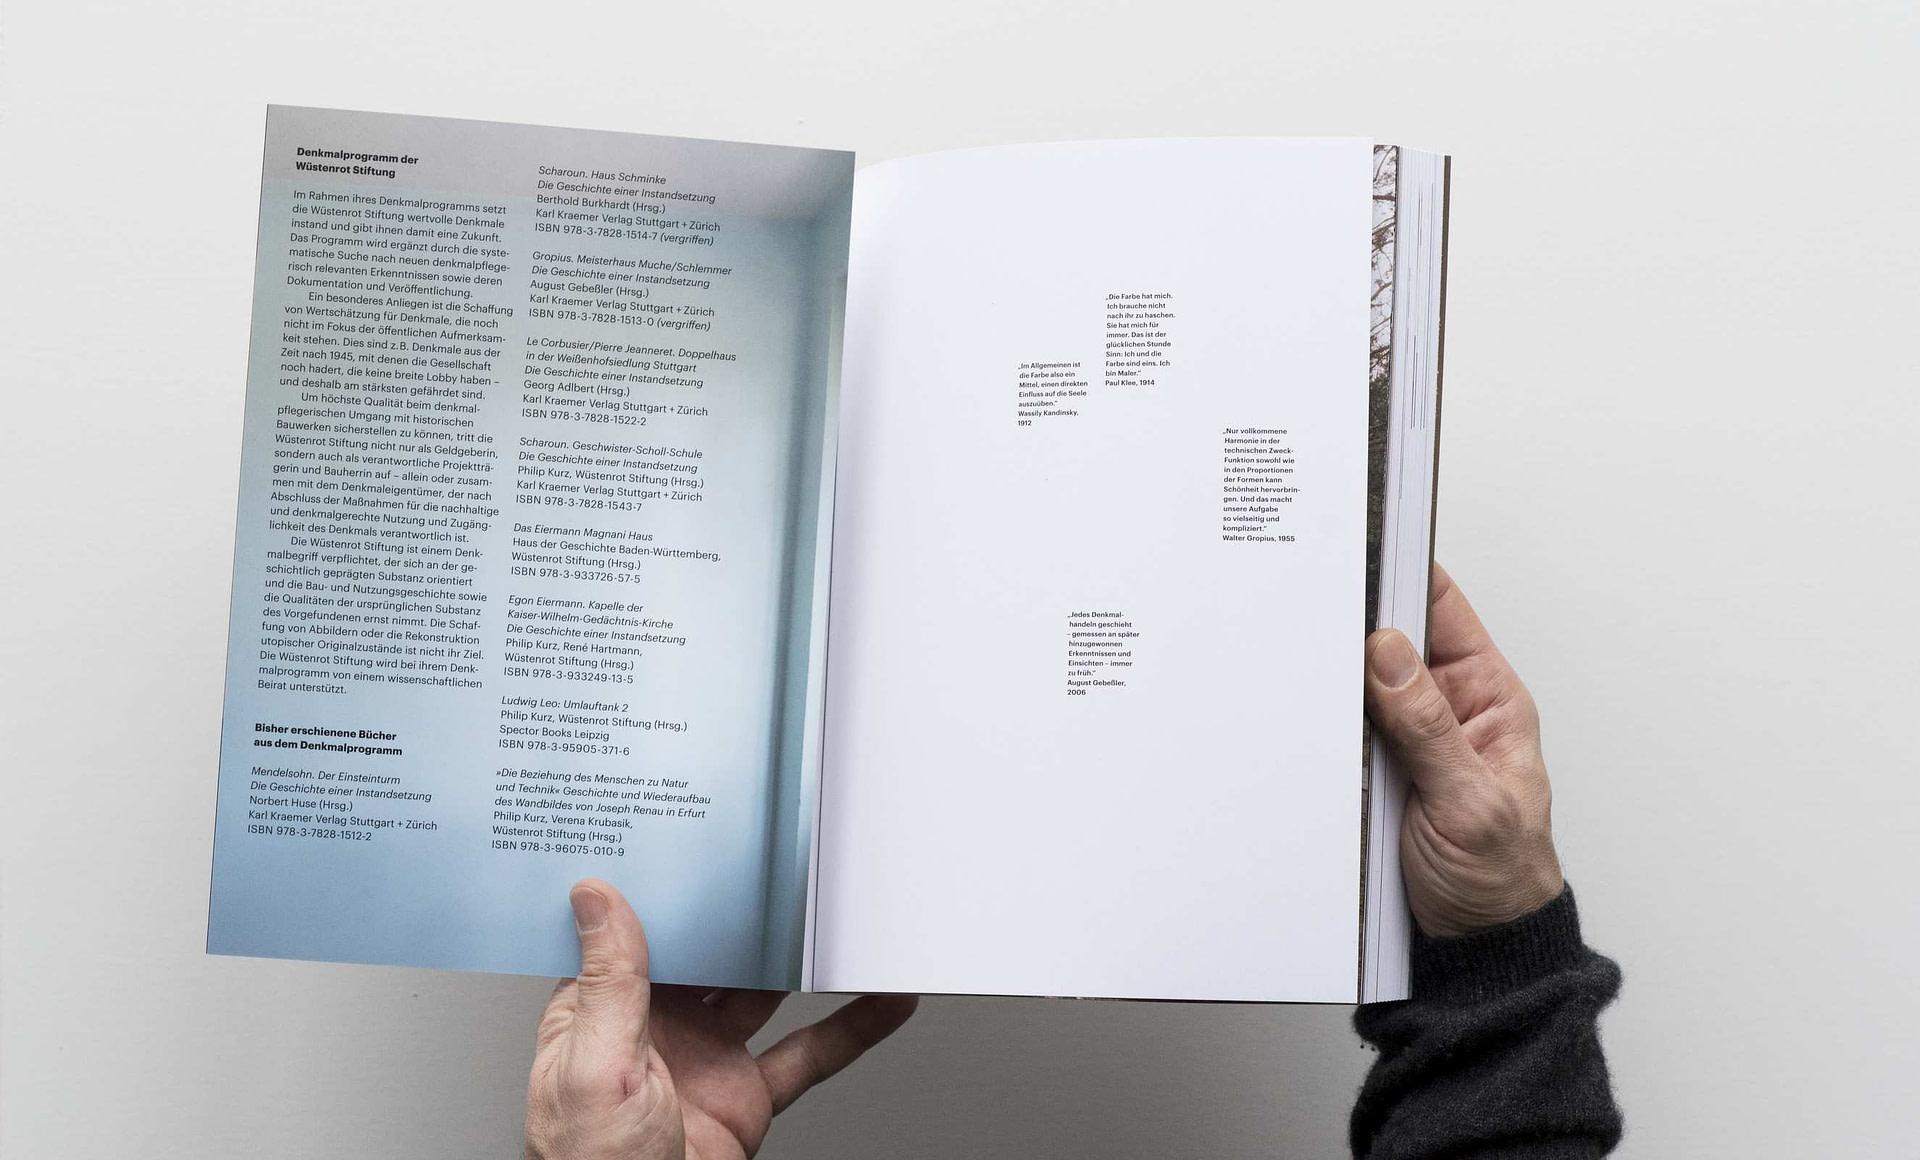 meisterhaus-kandinsky-klee-book-2-2650x1600px